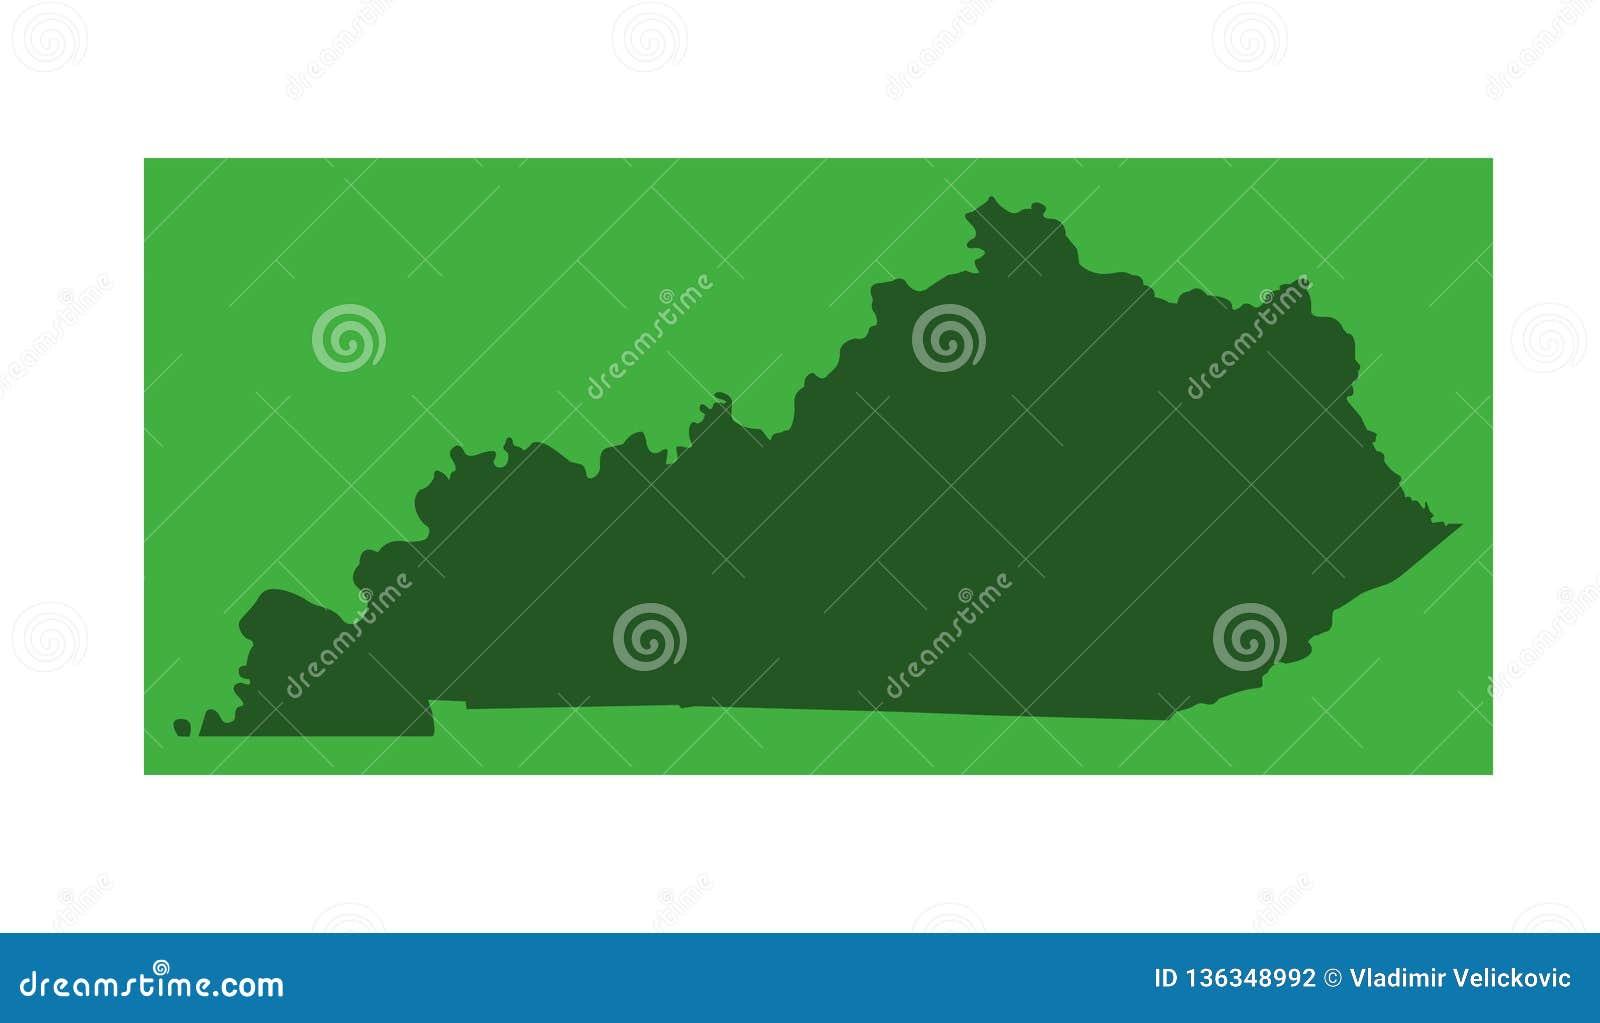 Kentucky Map - Commonwealth Of Kentucky Stock Vector - Illustration ...